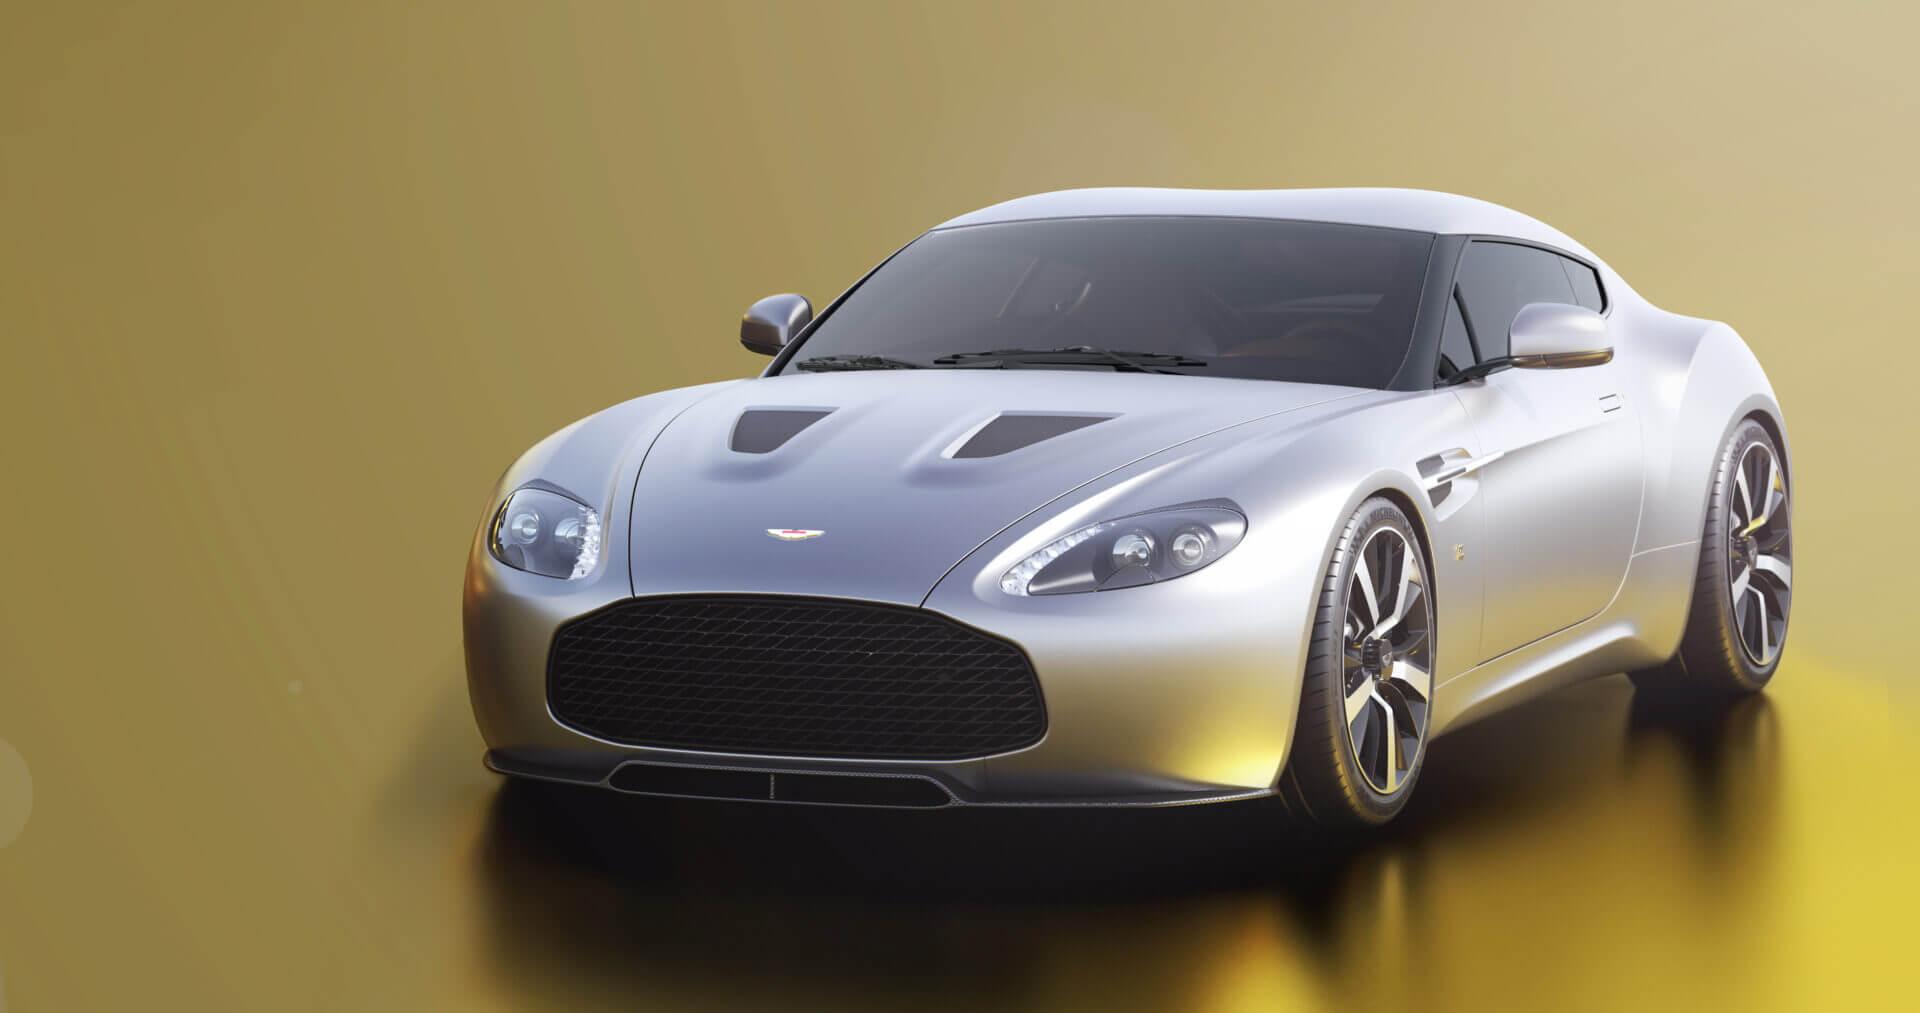 Mugs Cups Dishes Aston Martin V8 Vantage Classic Car Mug Limited Edition Guidohof